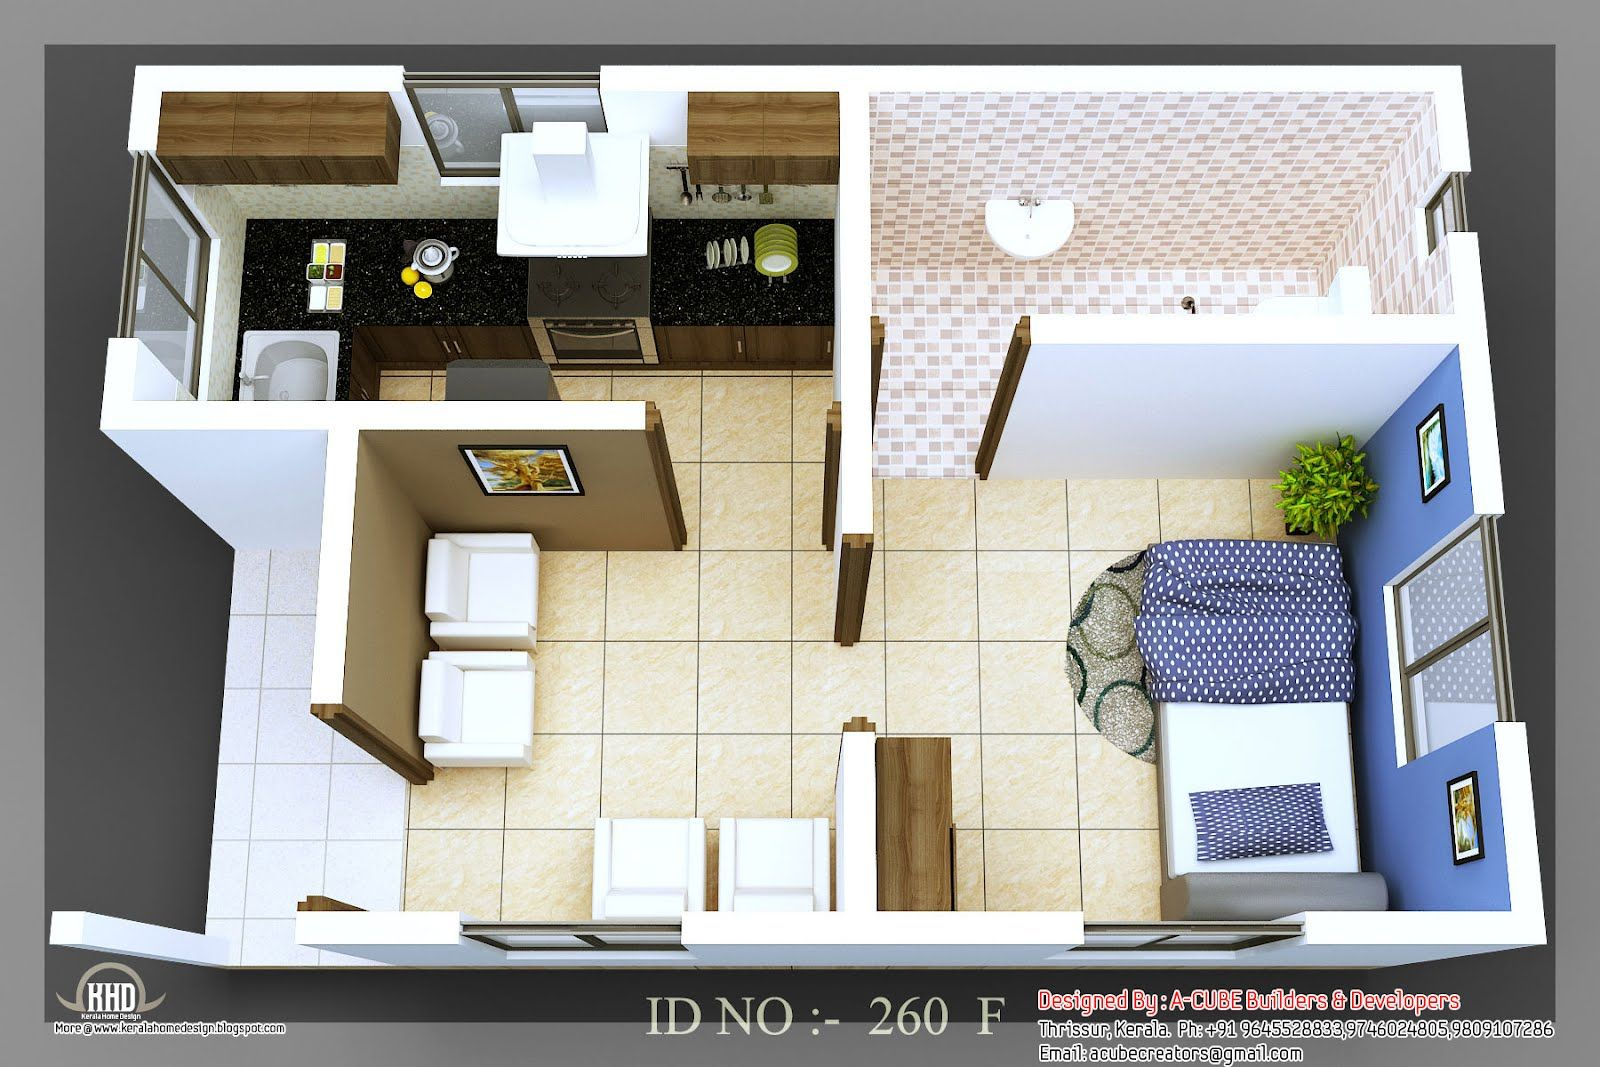 Fabulous Views Small House Plans Kerala Home Design Floor Plans Largest Home Design Picture Inspirations Pitcheantrous